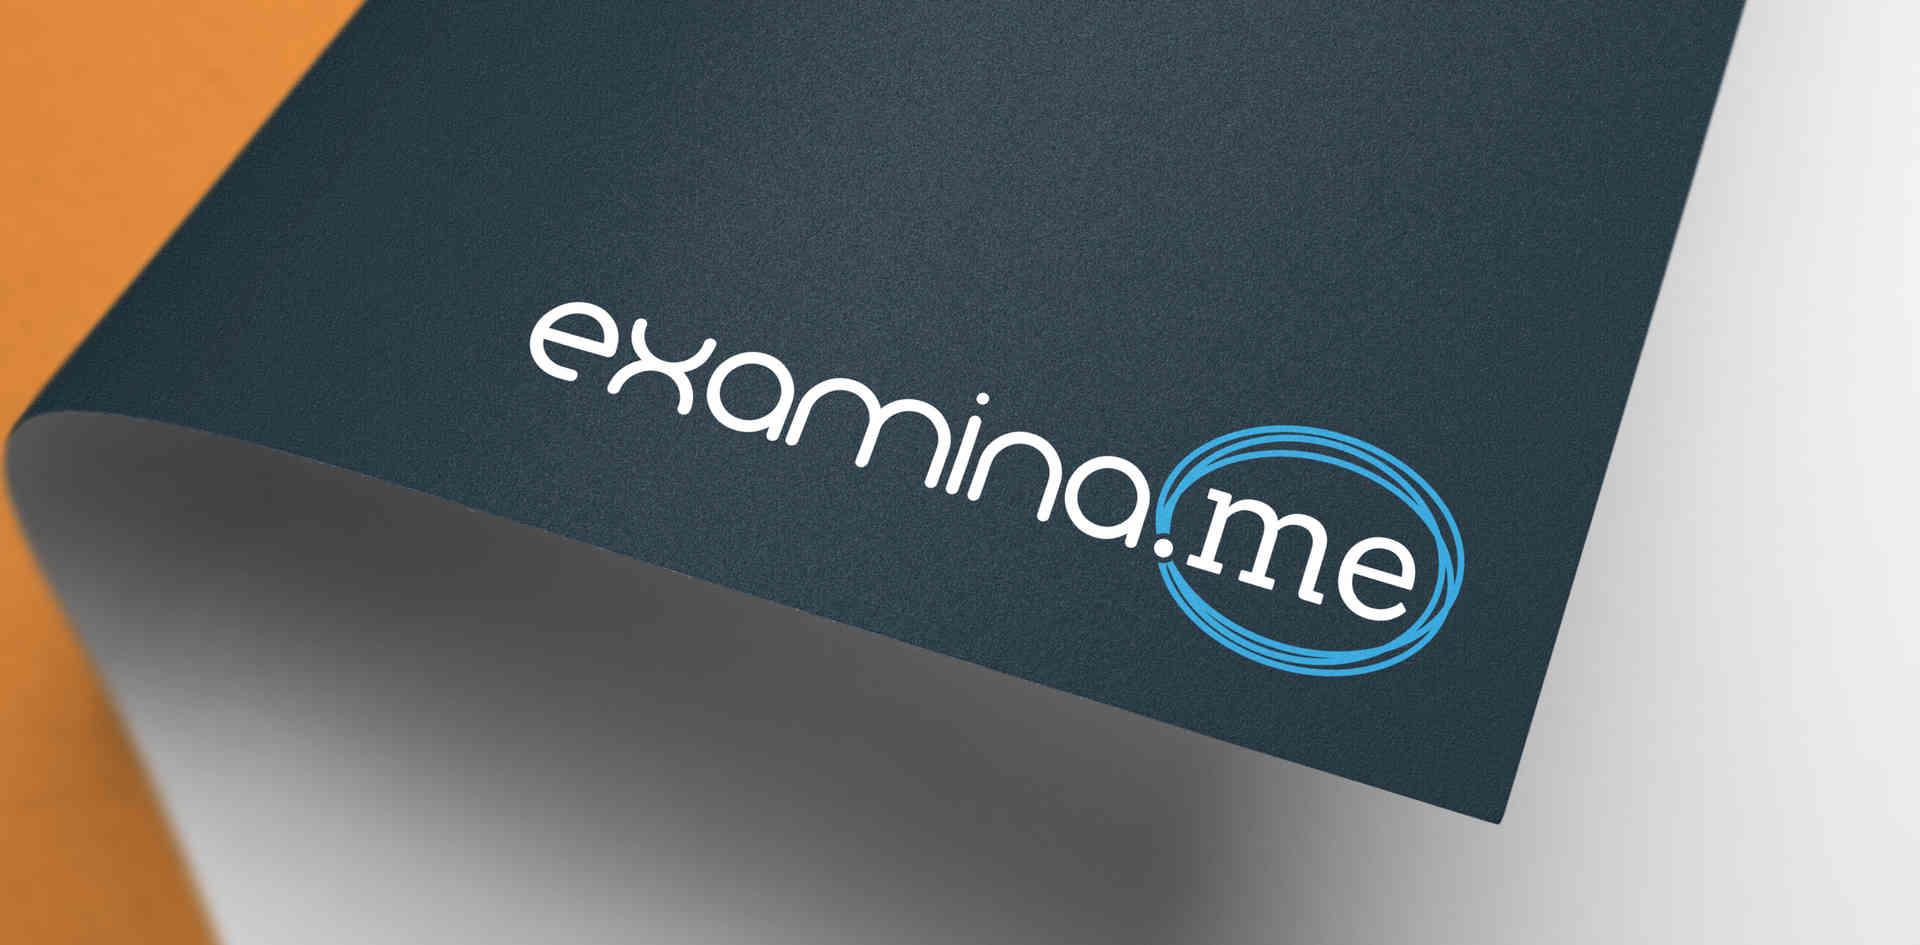 Logotipo - Examina.me